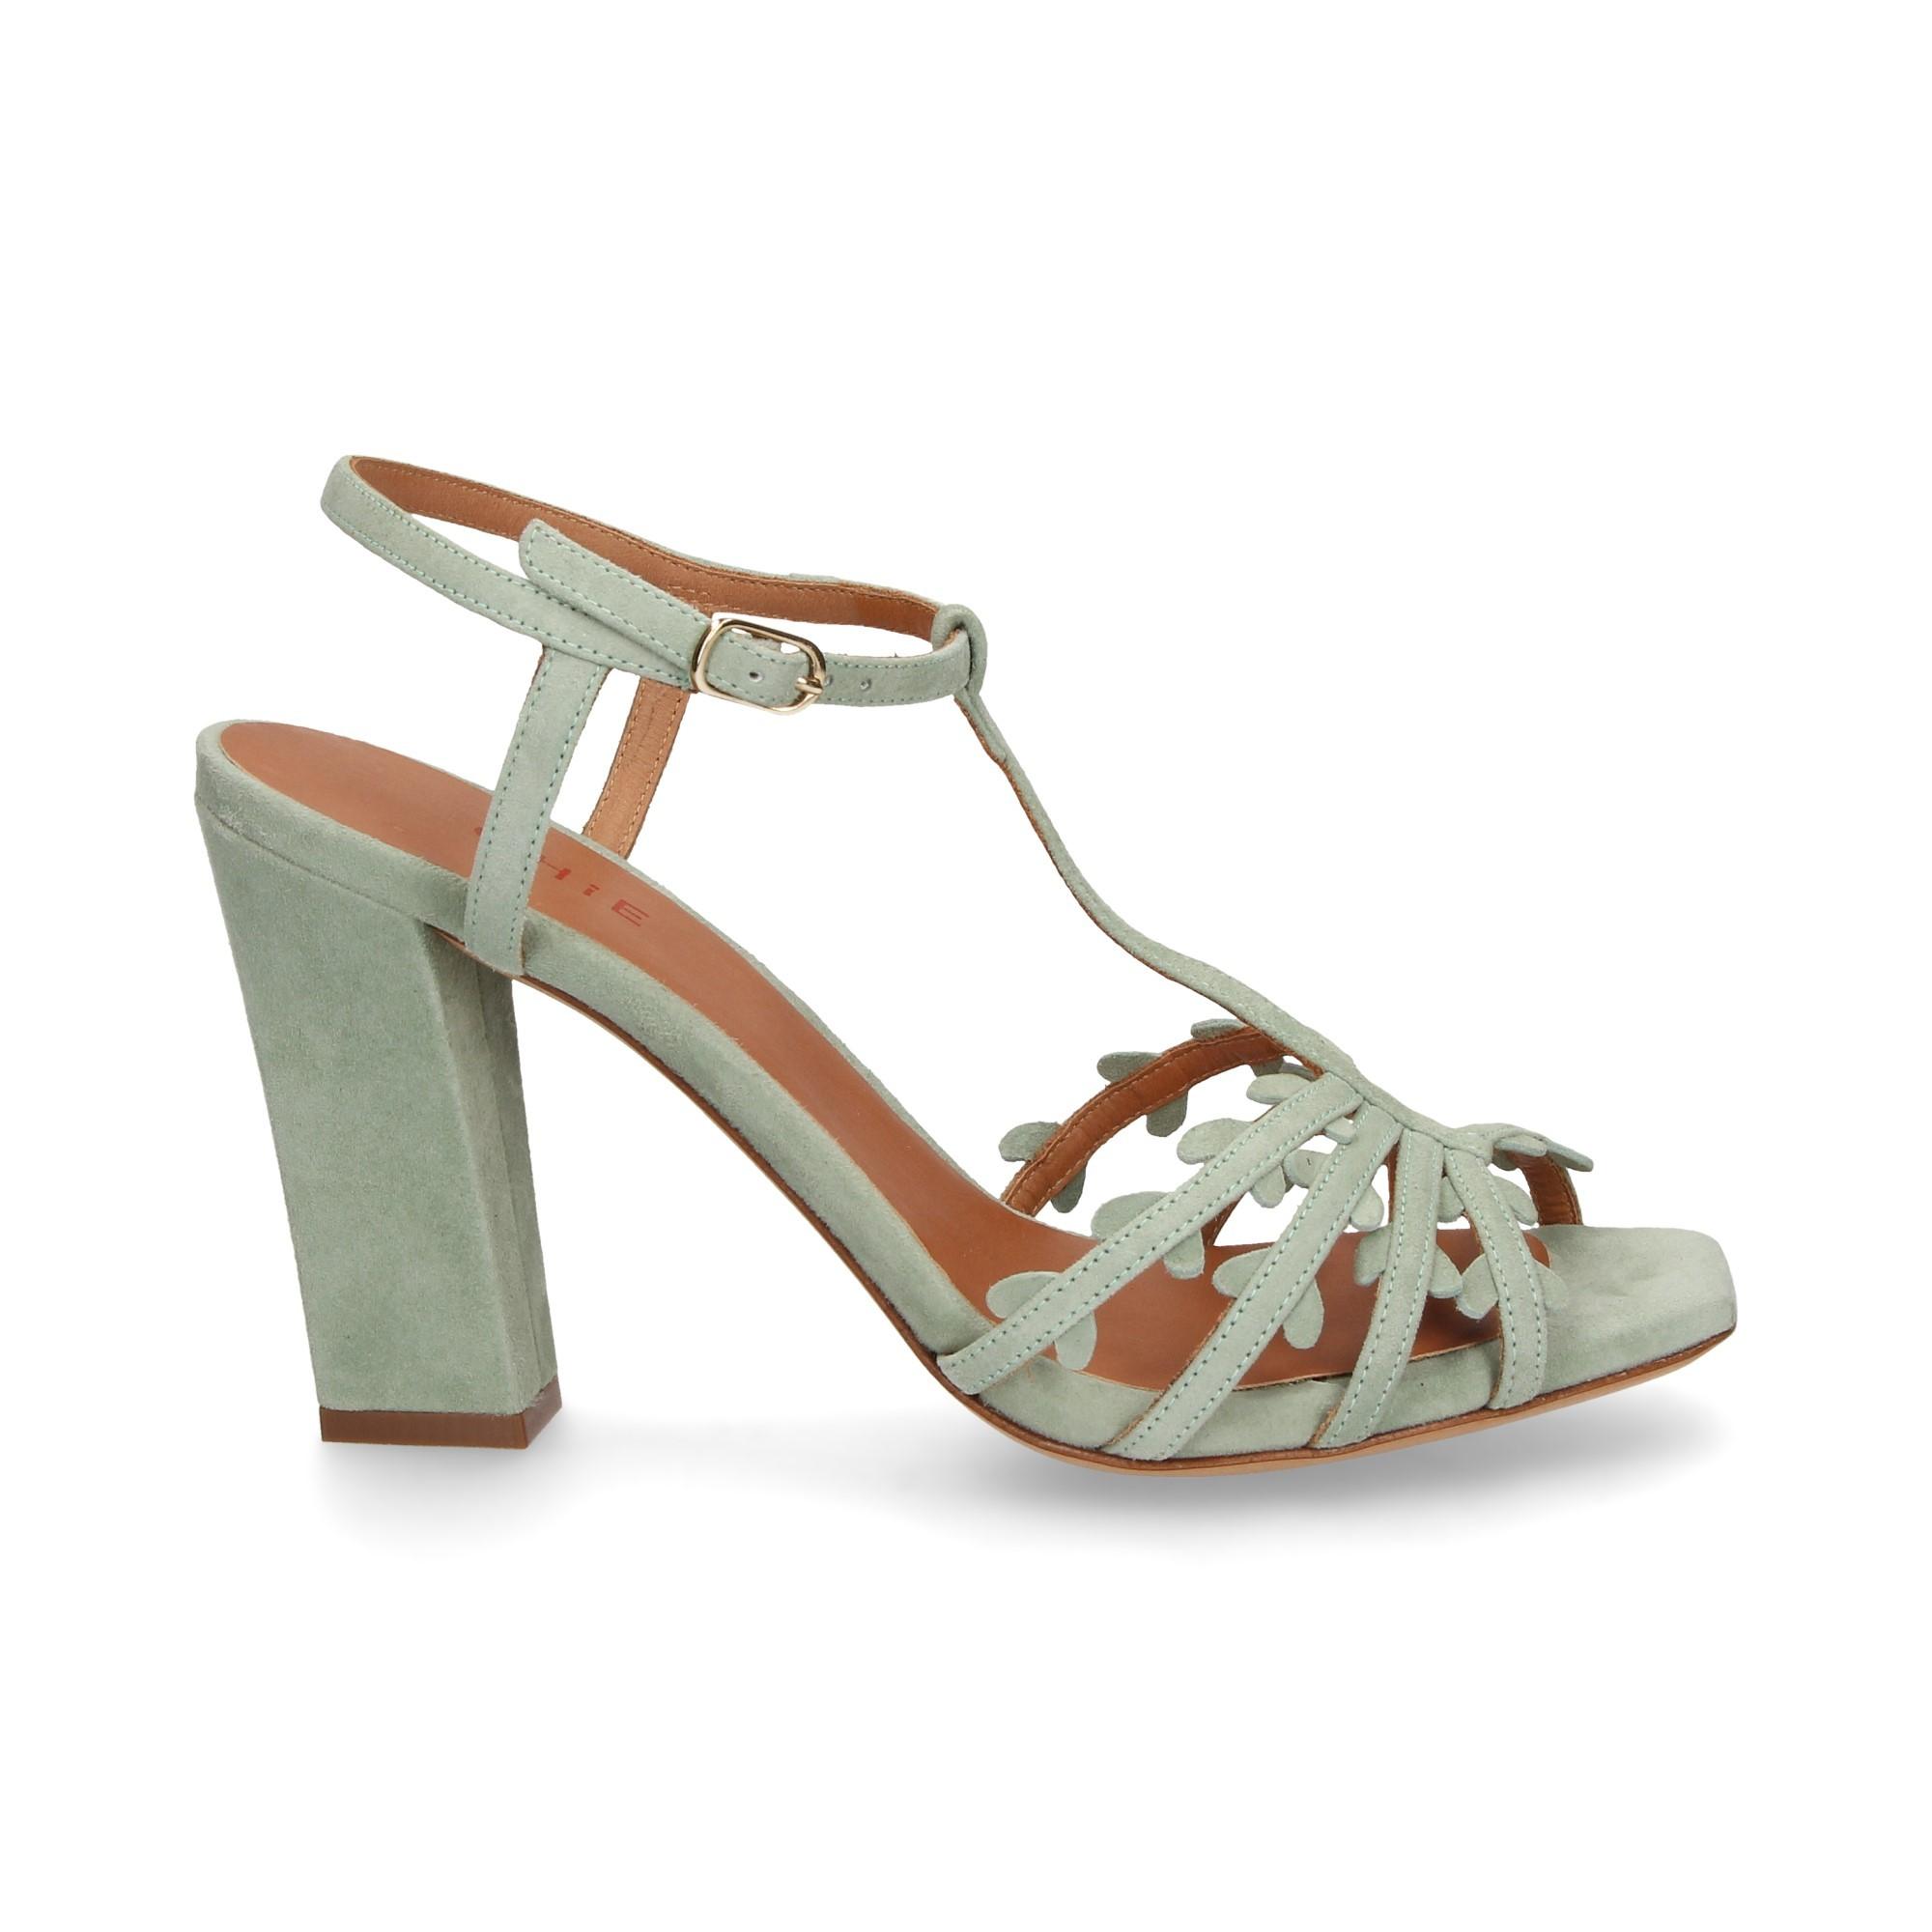 bf1aec1520c11 CHIE MIHARA Women s heeled sandals JANINA TURQUESA